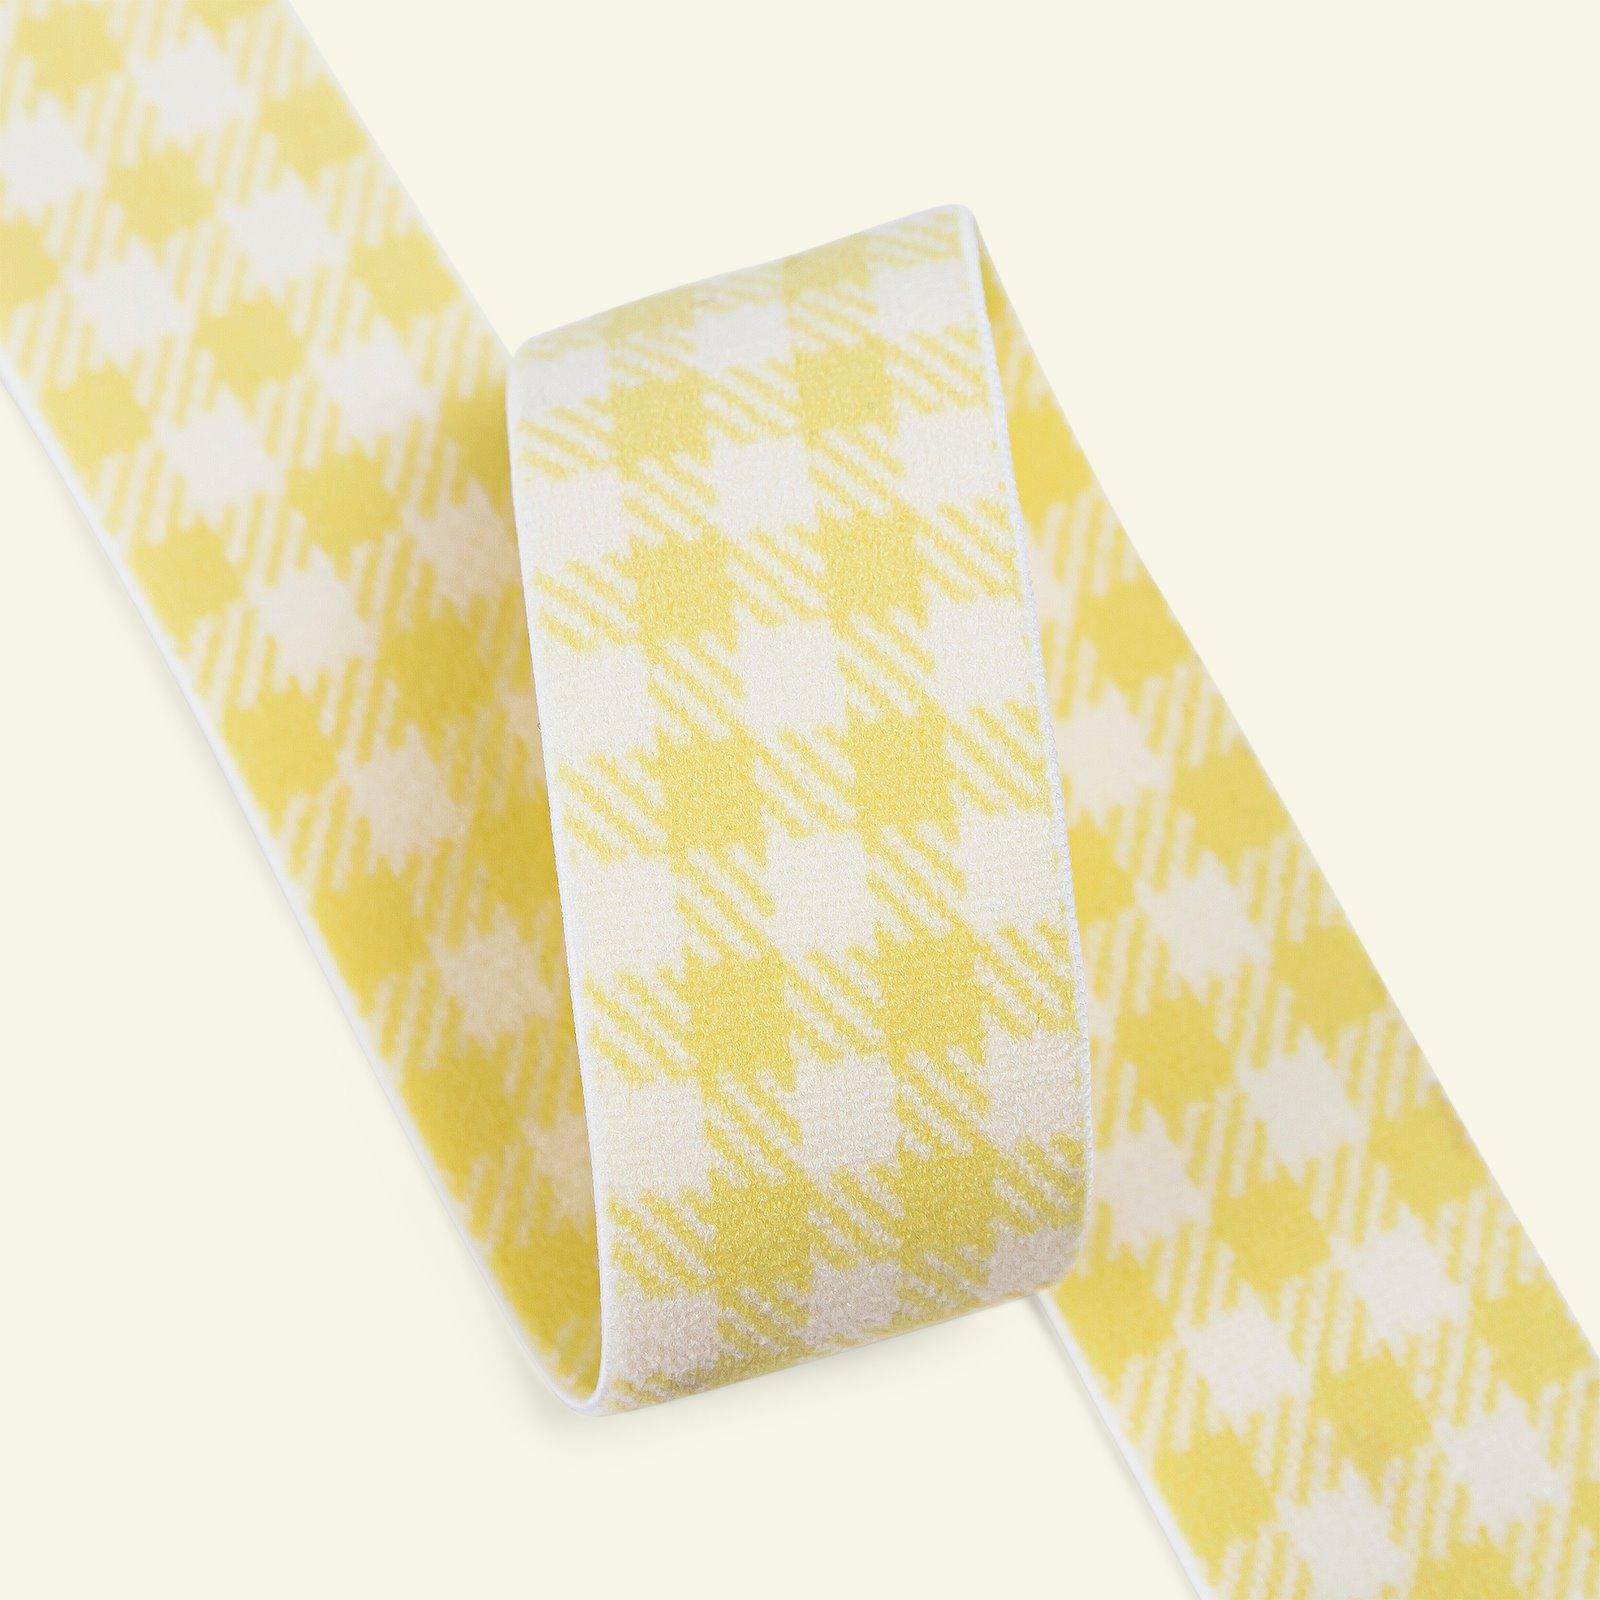 Elastic check 31mm light yellow 2m 3509087_pack